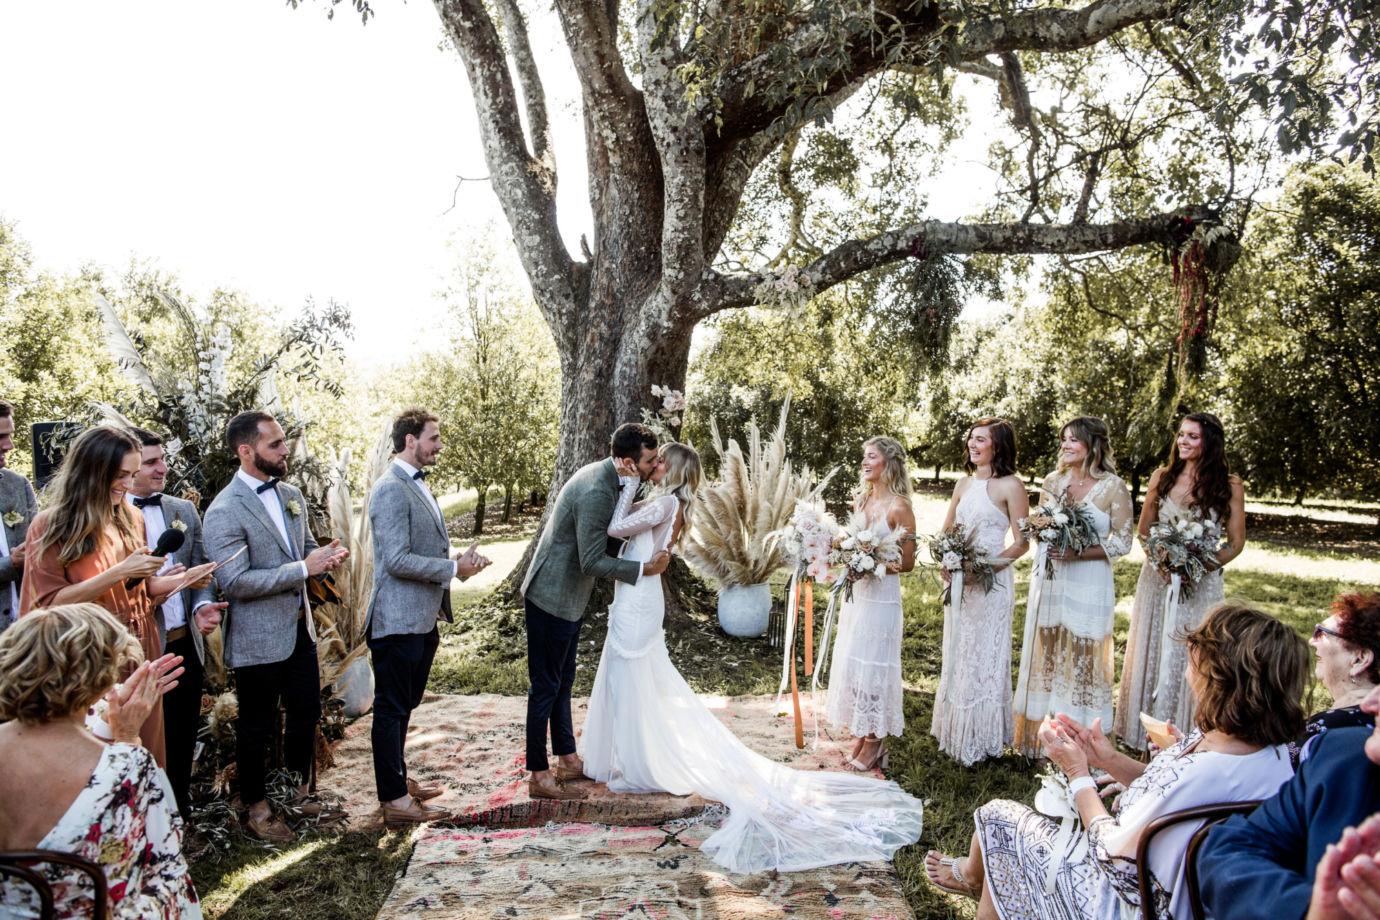 Real Wedding: Ellie + Alex, The Orchard Estate Byron Bay Wedding   Styled by The Events Lounge, Byron Bay Wedding Planner